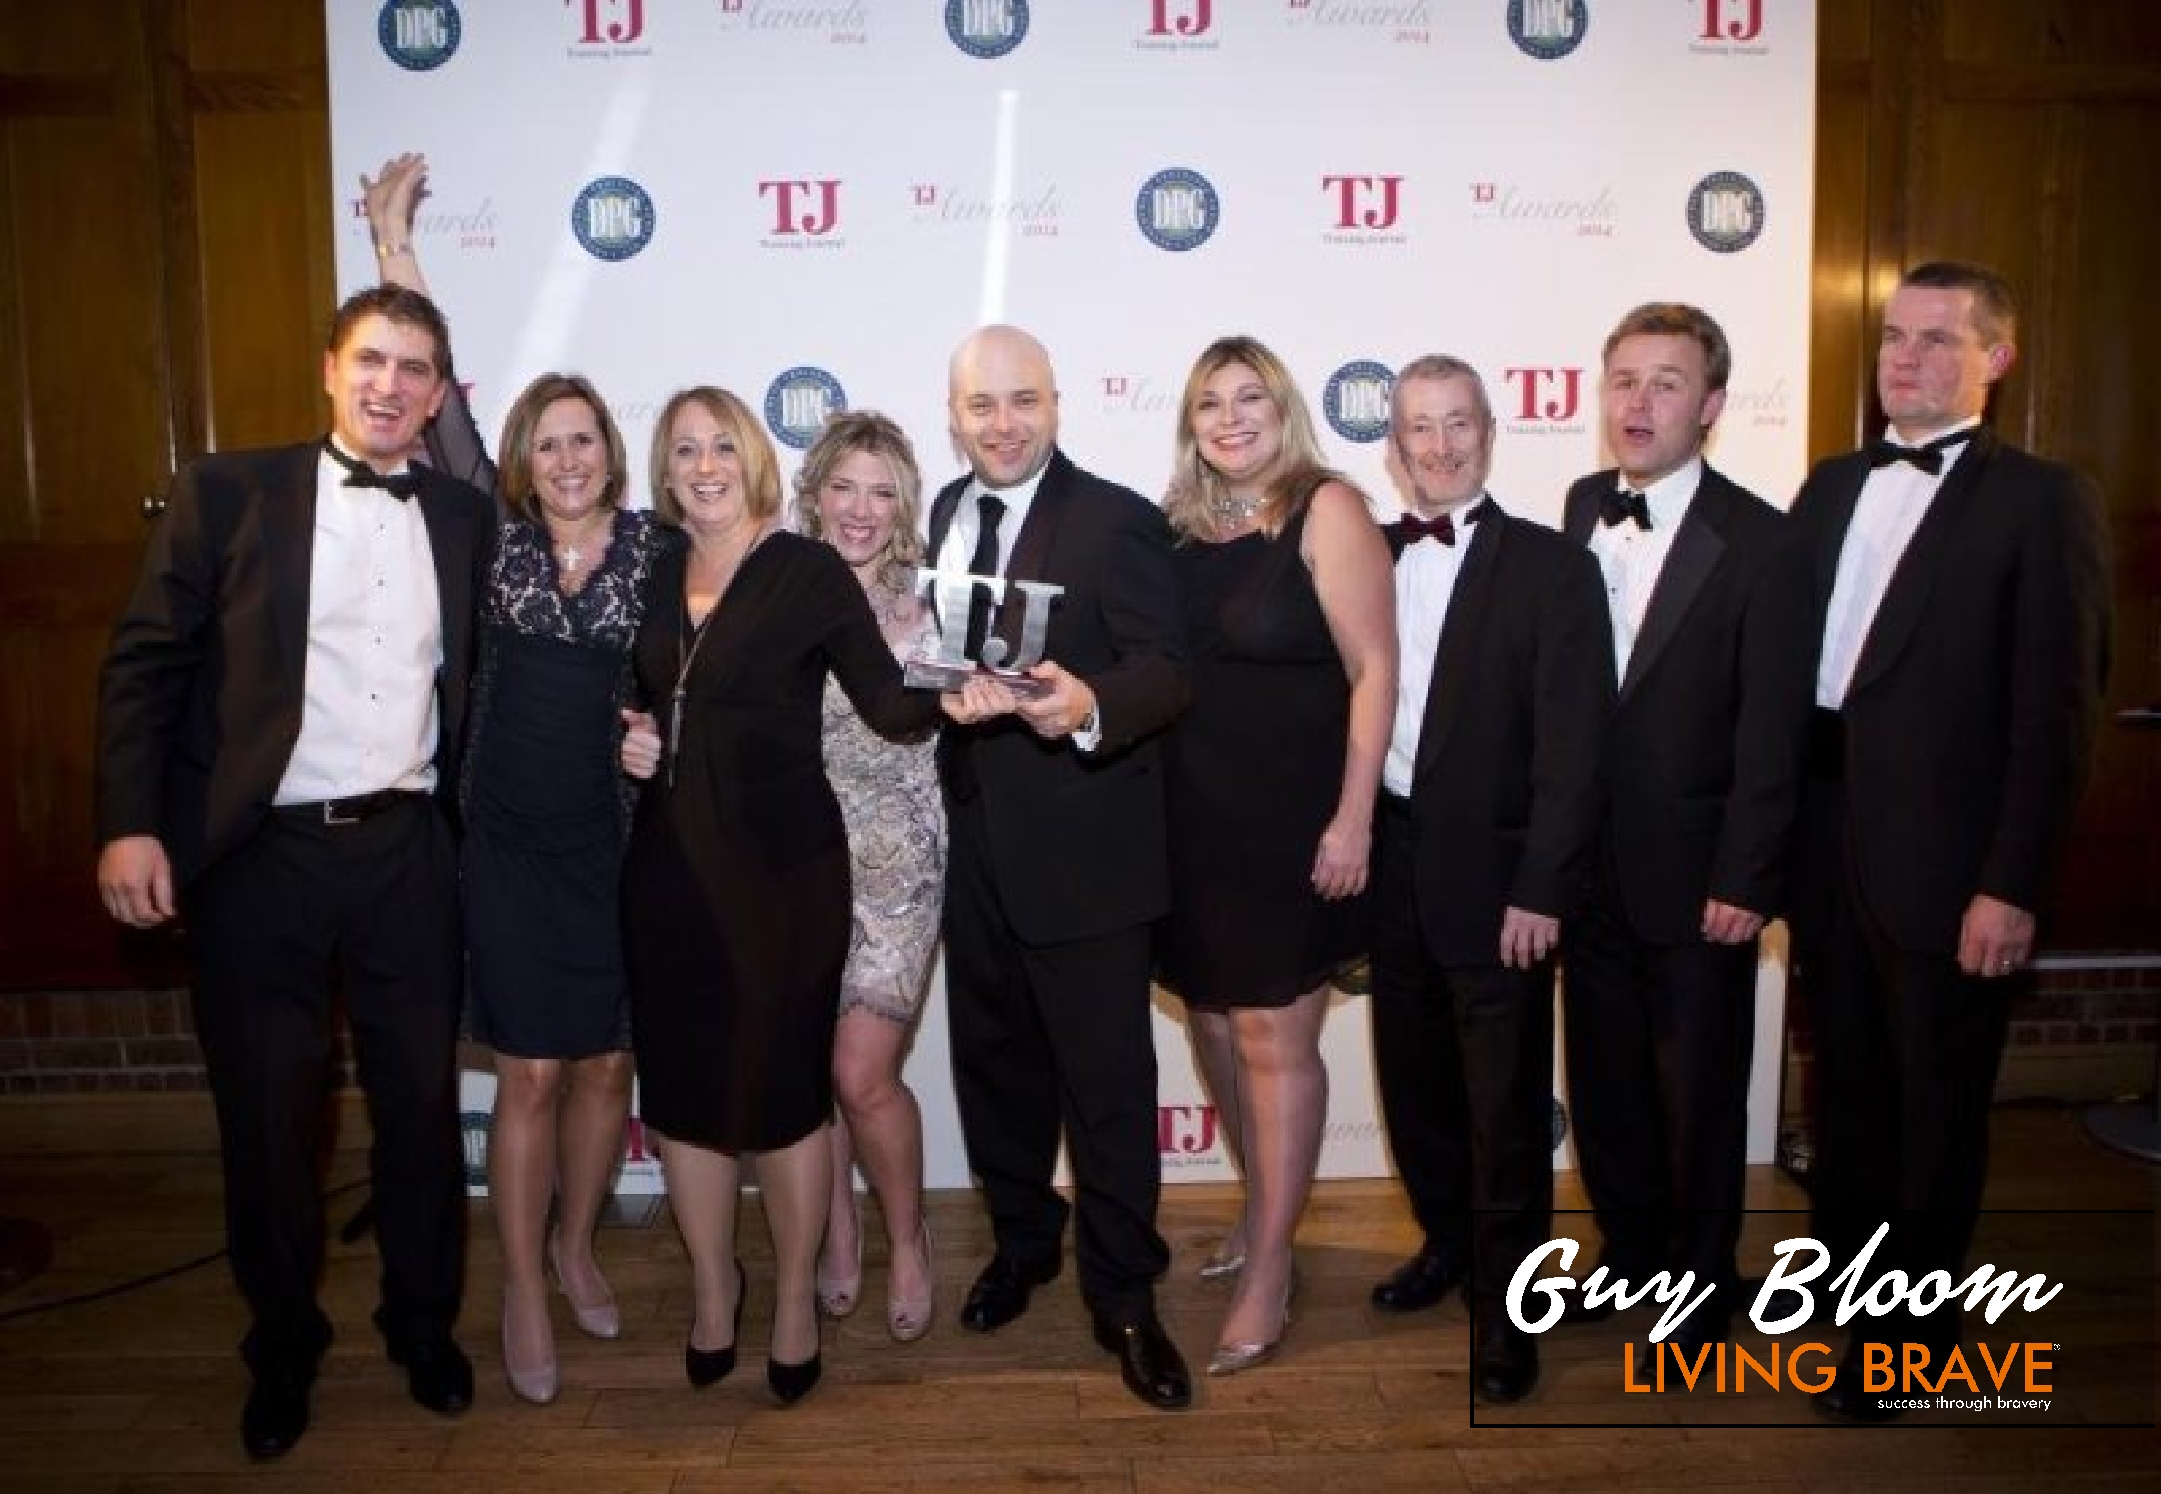 Winning Best Leadership Programme with VINCI Plc